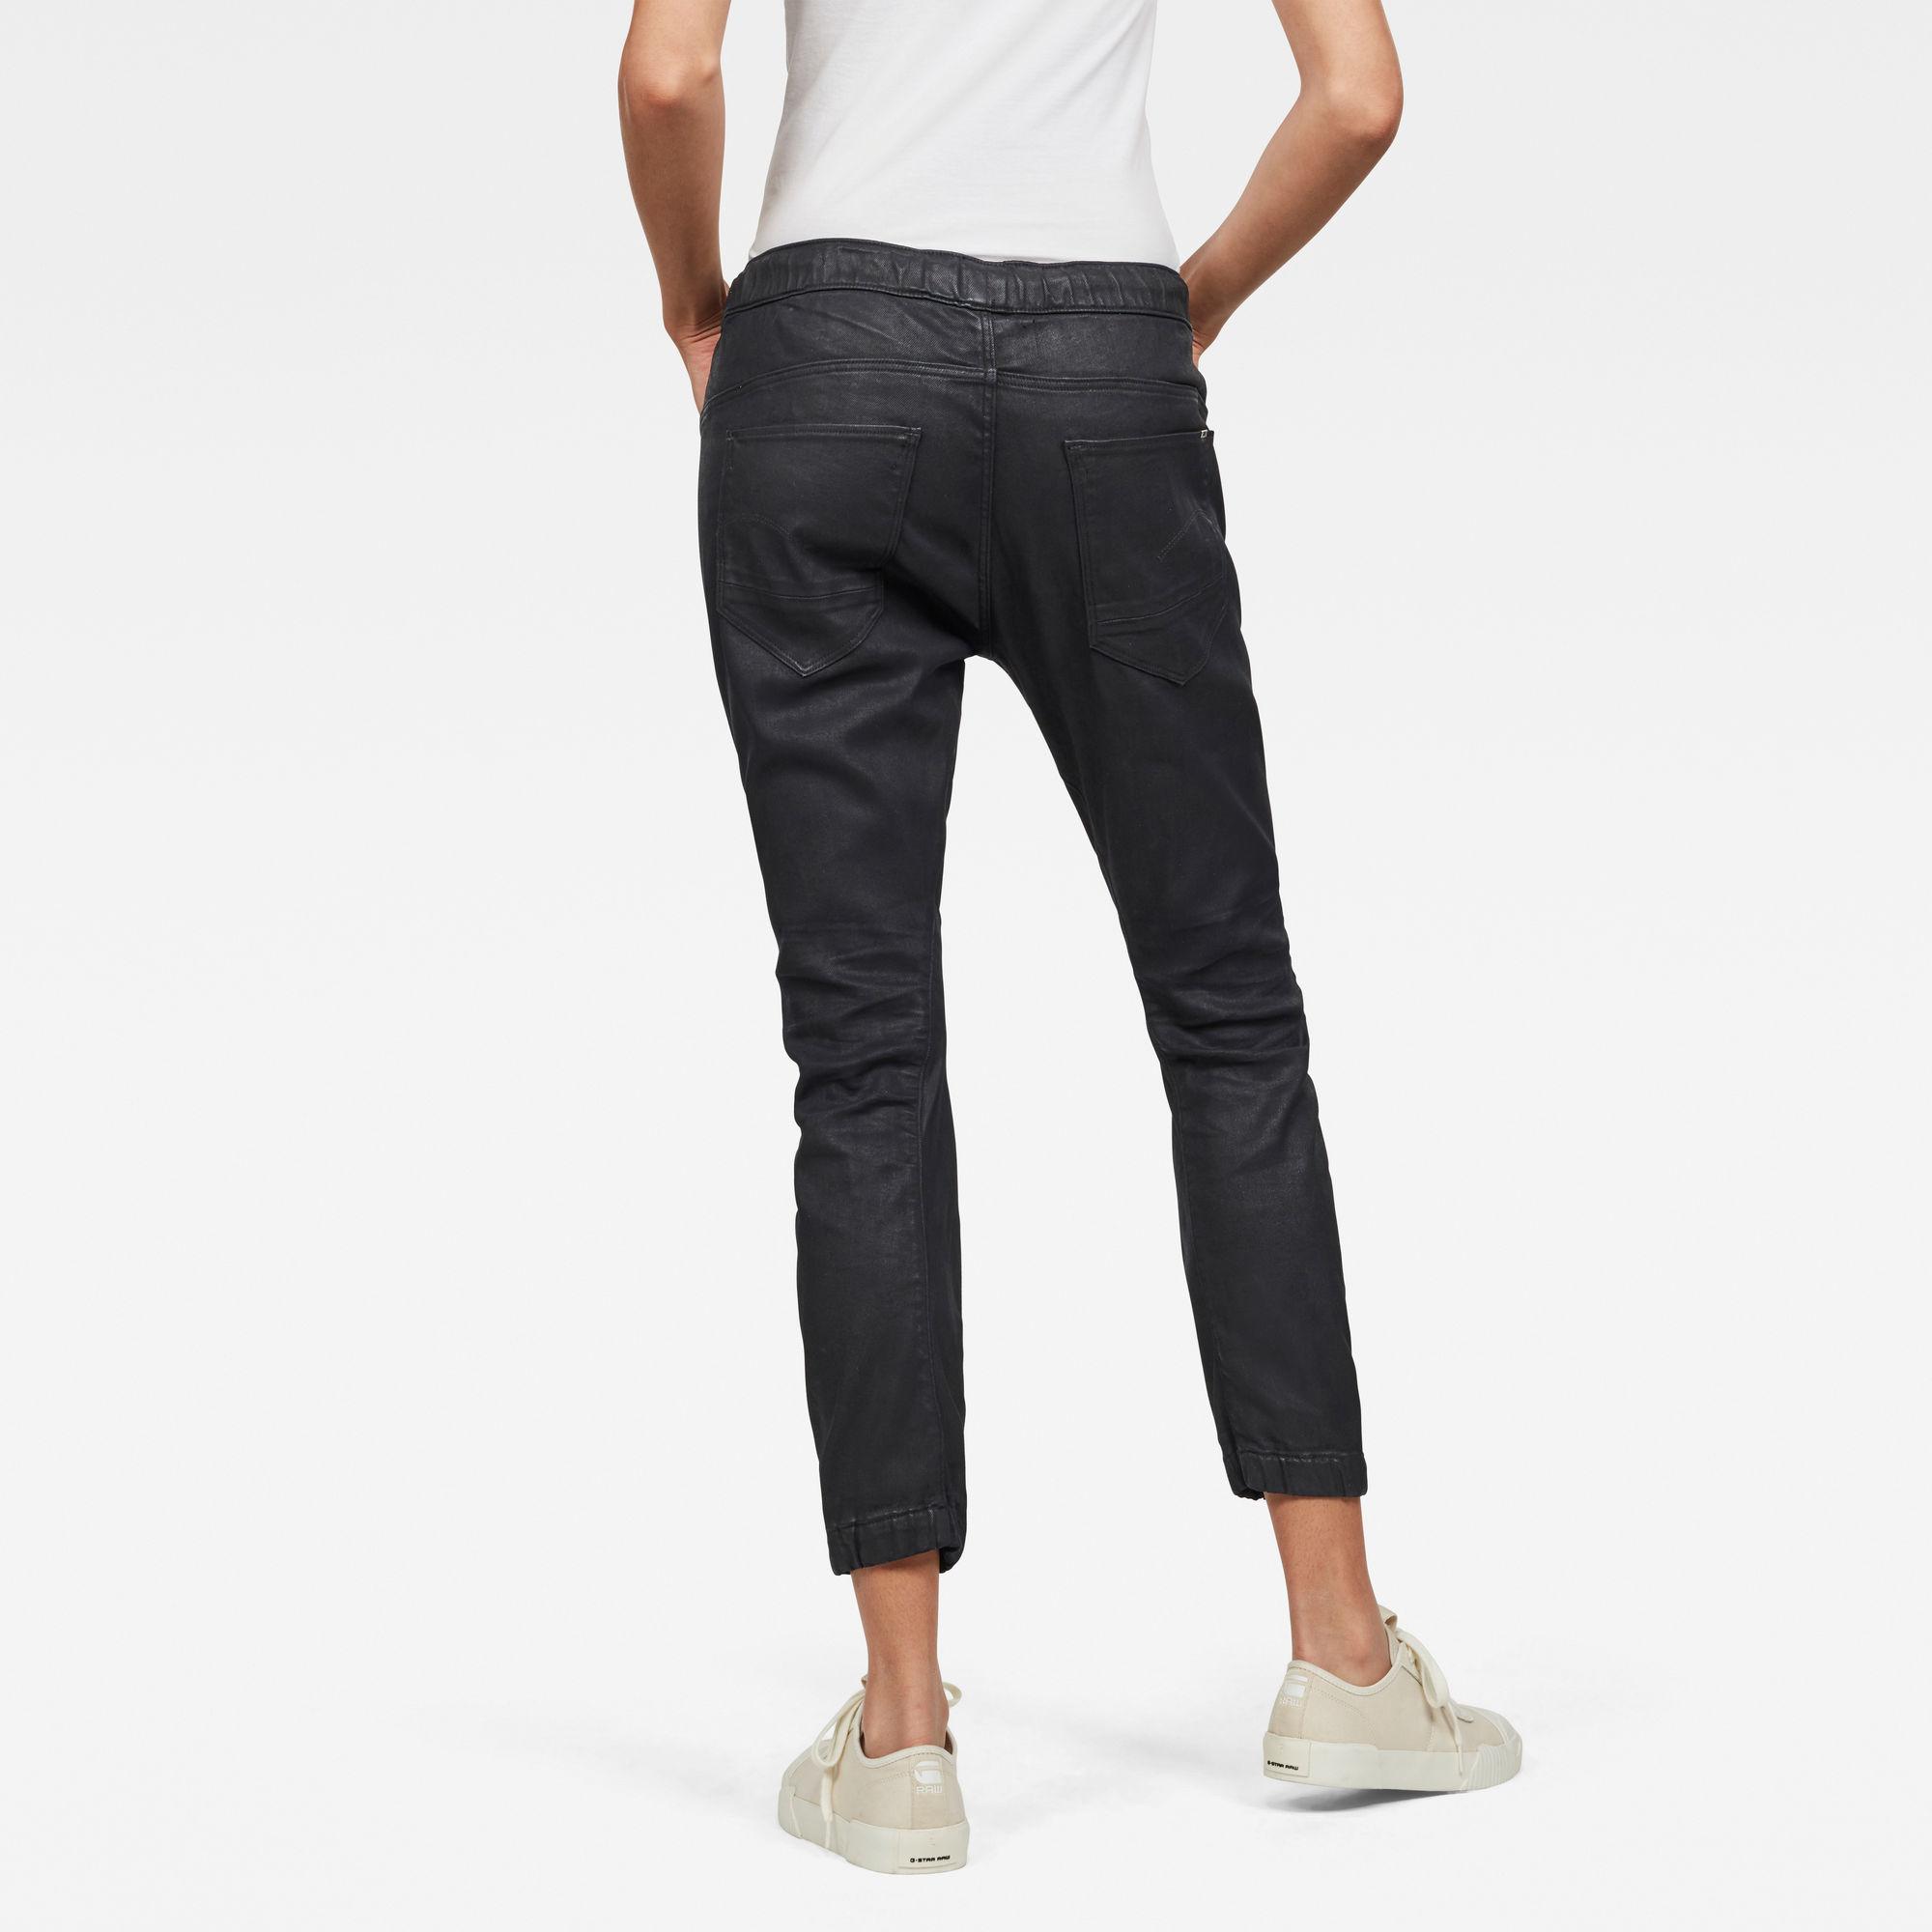 G-Star RAW Arc 3D Slim Sport Low Boyfriend Jeans